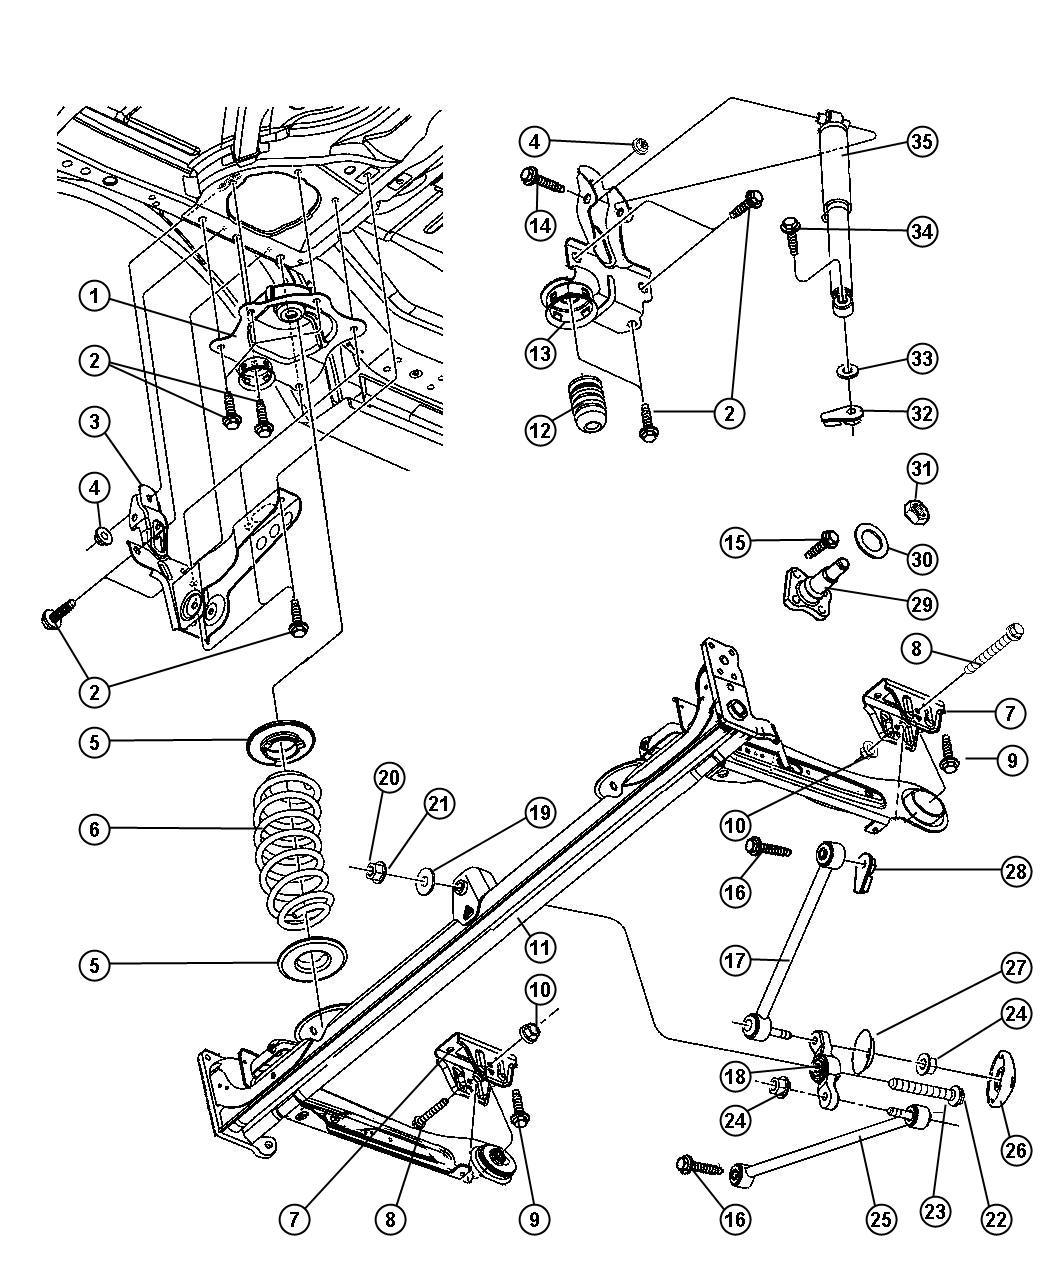 Chrysler Pt Cruiser Spindle Rear Suspension Brake